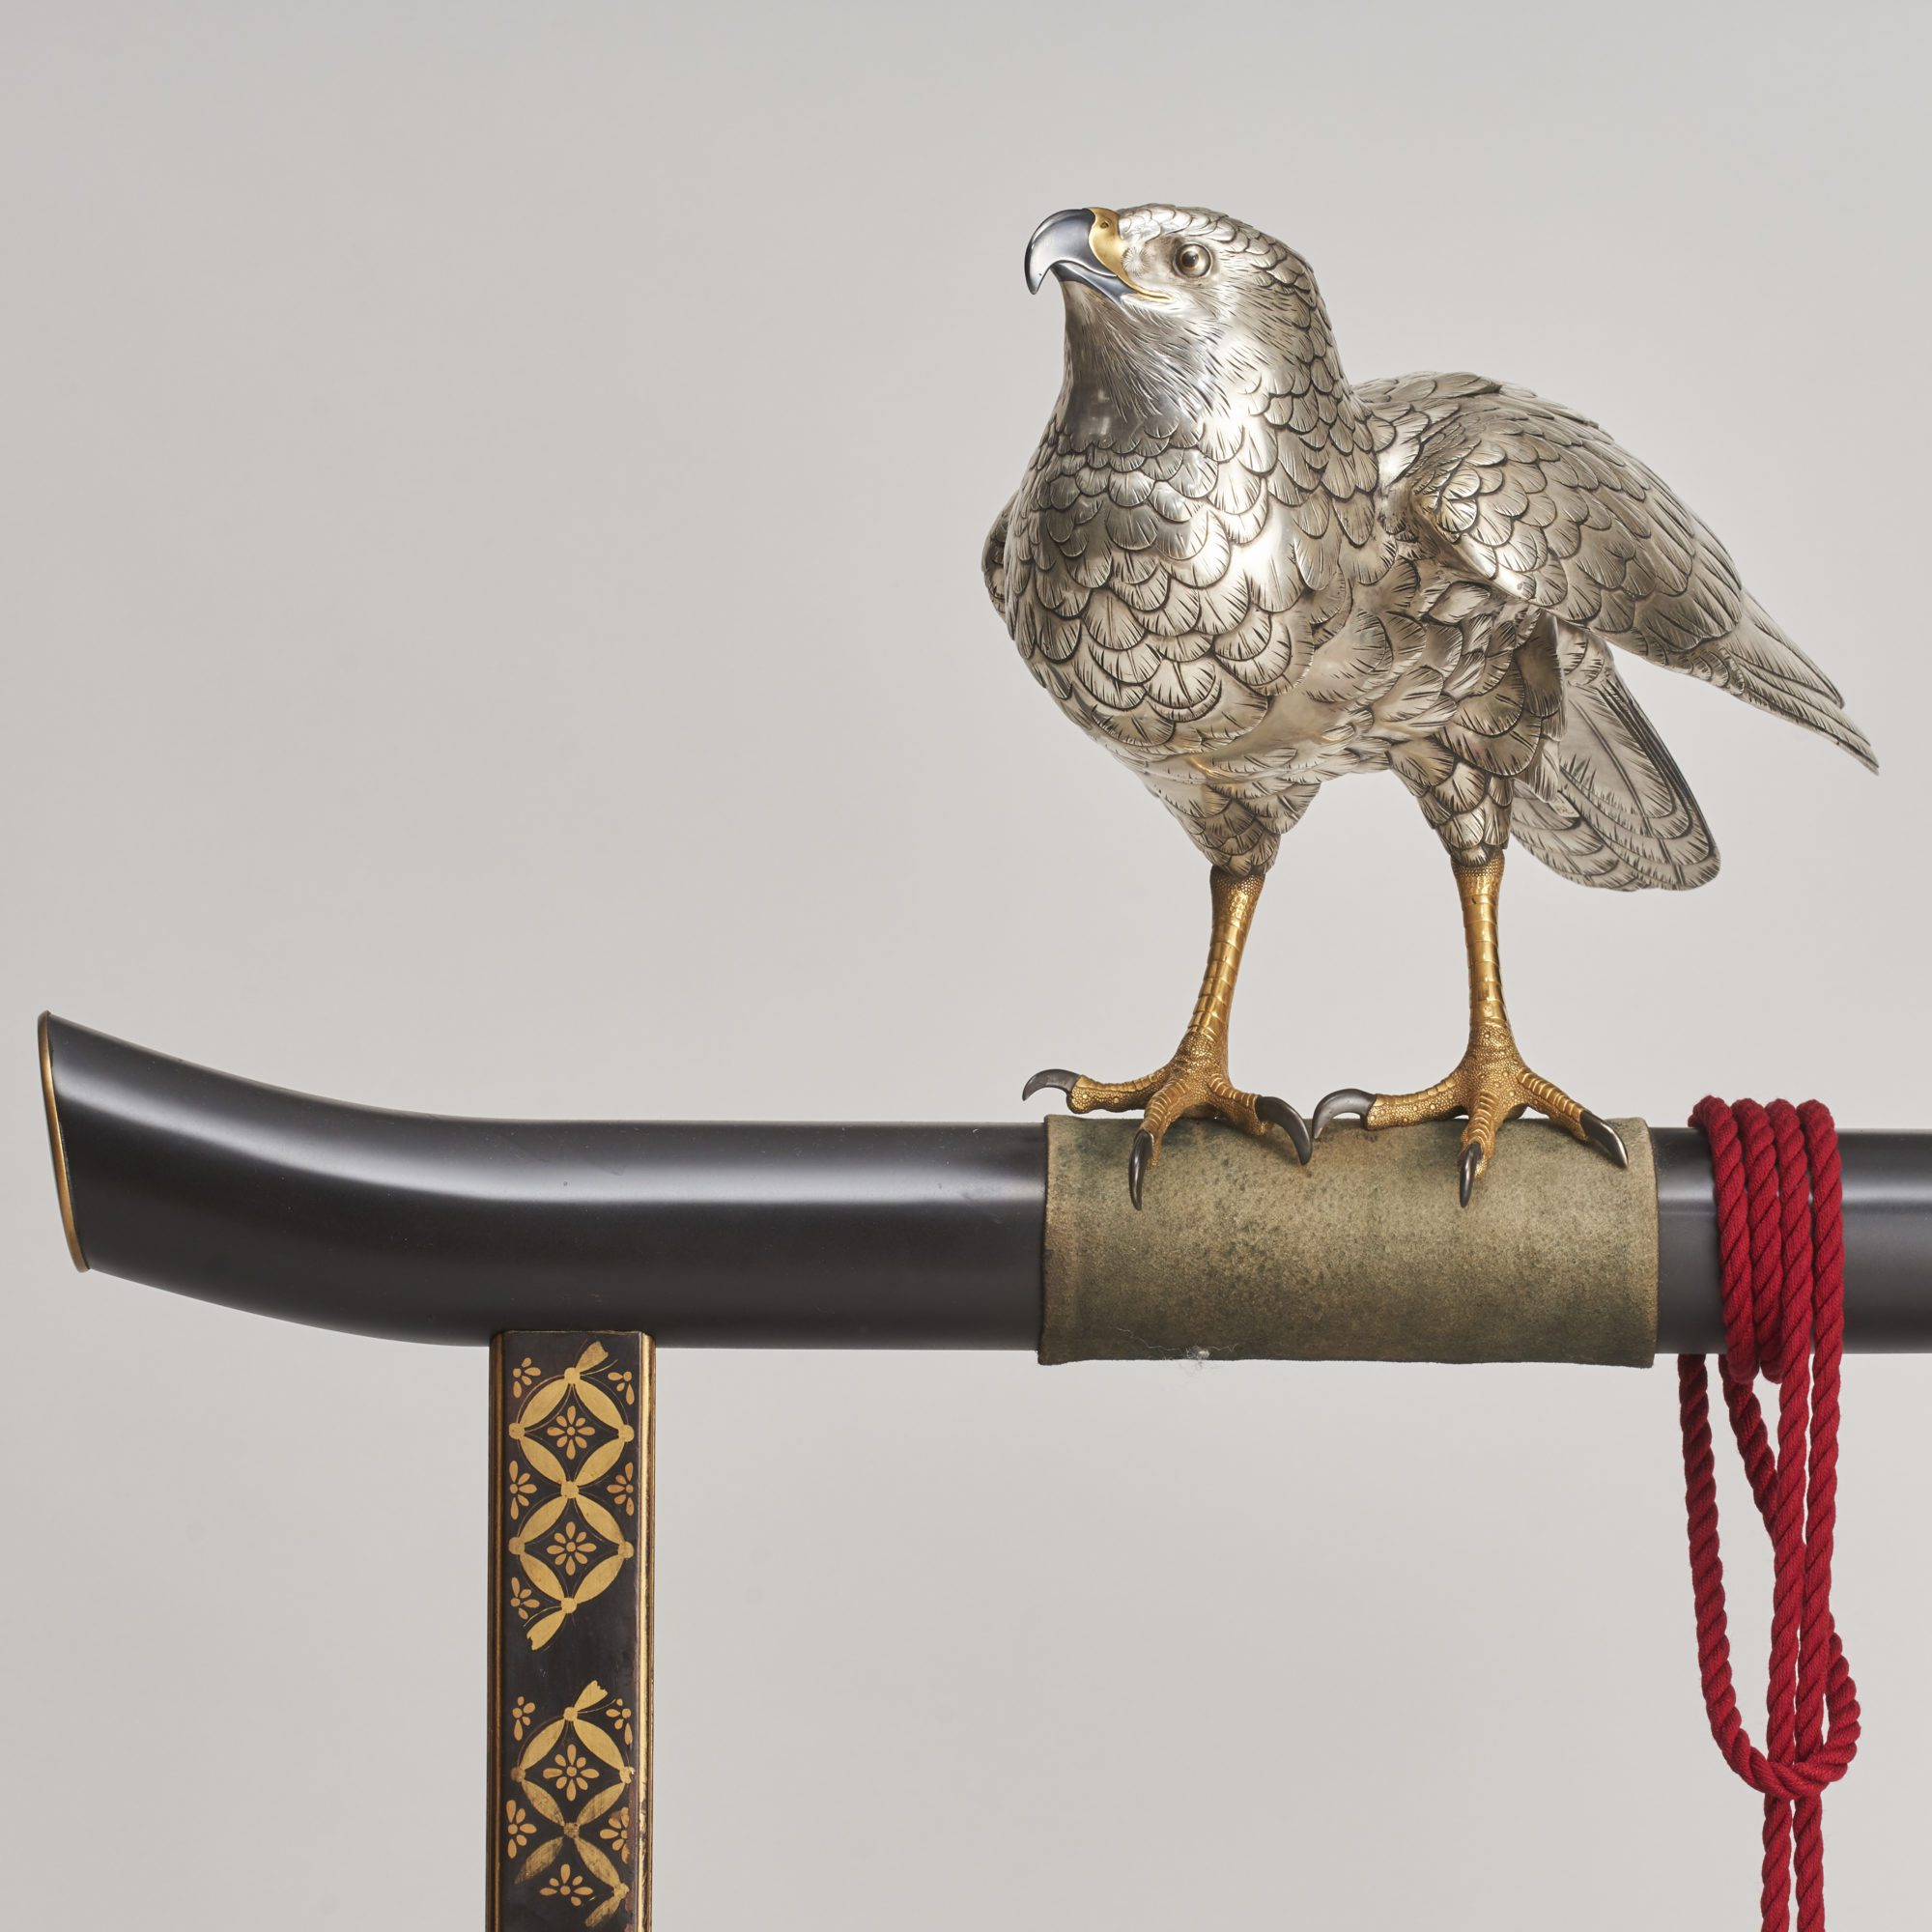 Silver hawk   A majestic, life-size silvered Bronze Okimono of a Hawk on a superb lacquer stand, (Japanese Meiji-era)